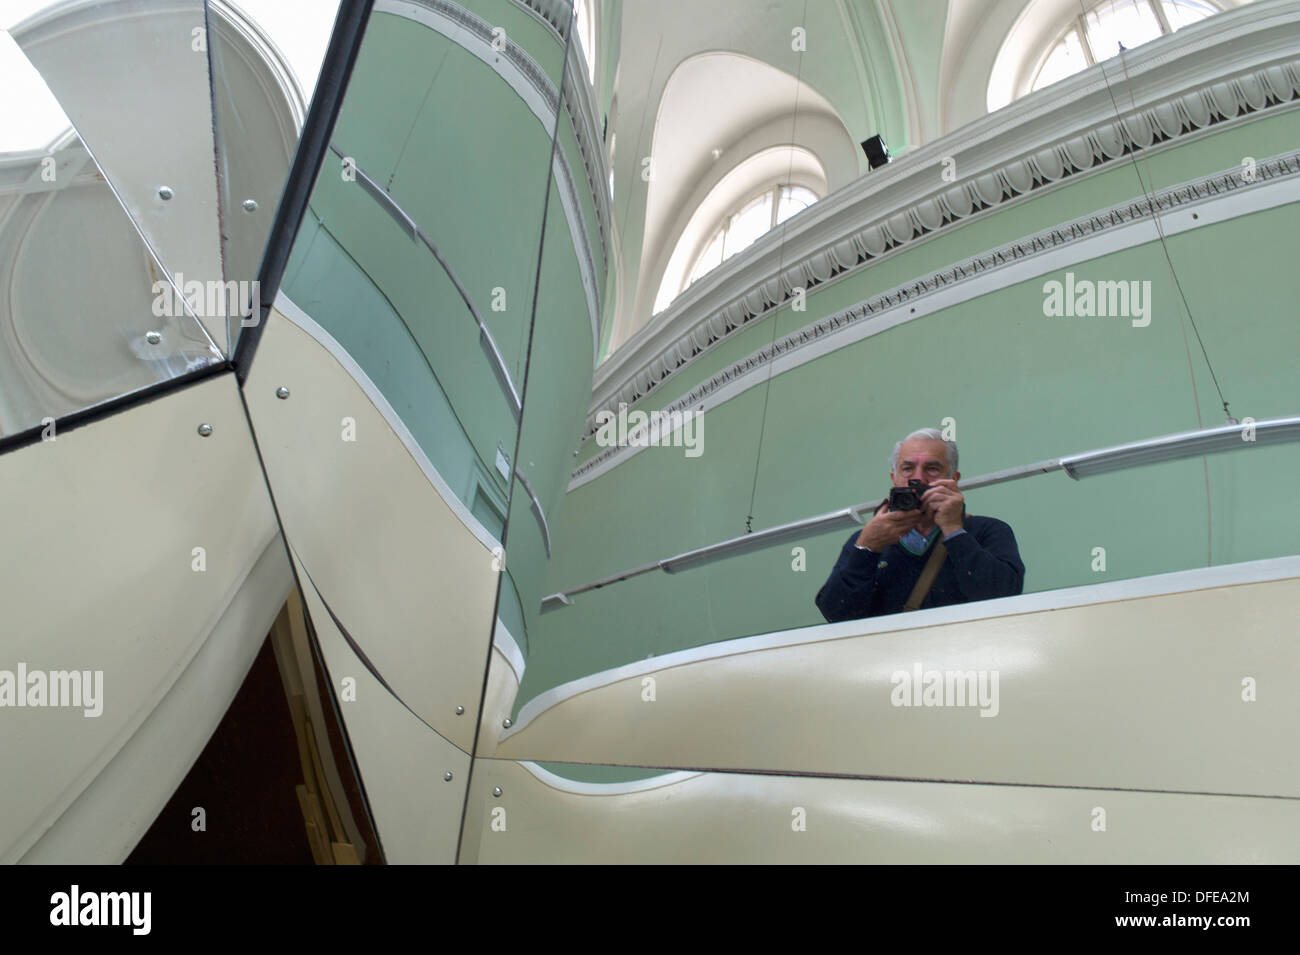 Jota Castro,2011, mixed media, dimensions variable. Dublin Contemporary. City of Dublin capital. Ireland Eire. - Stock Image